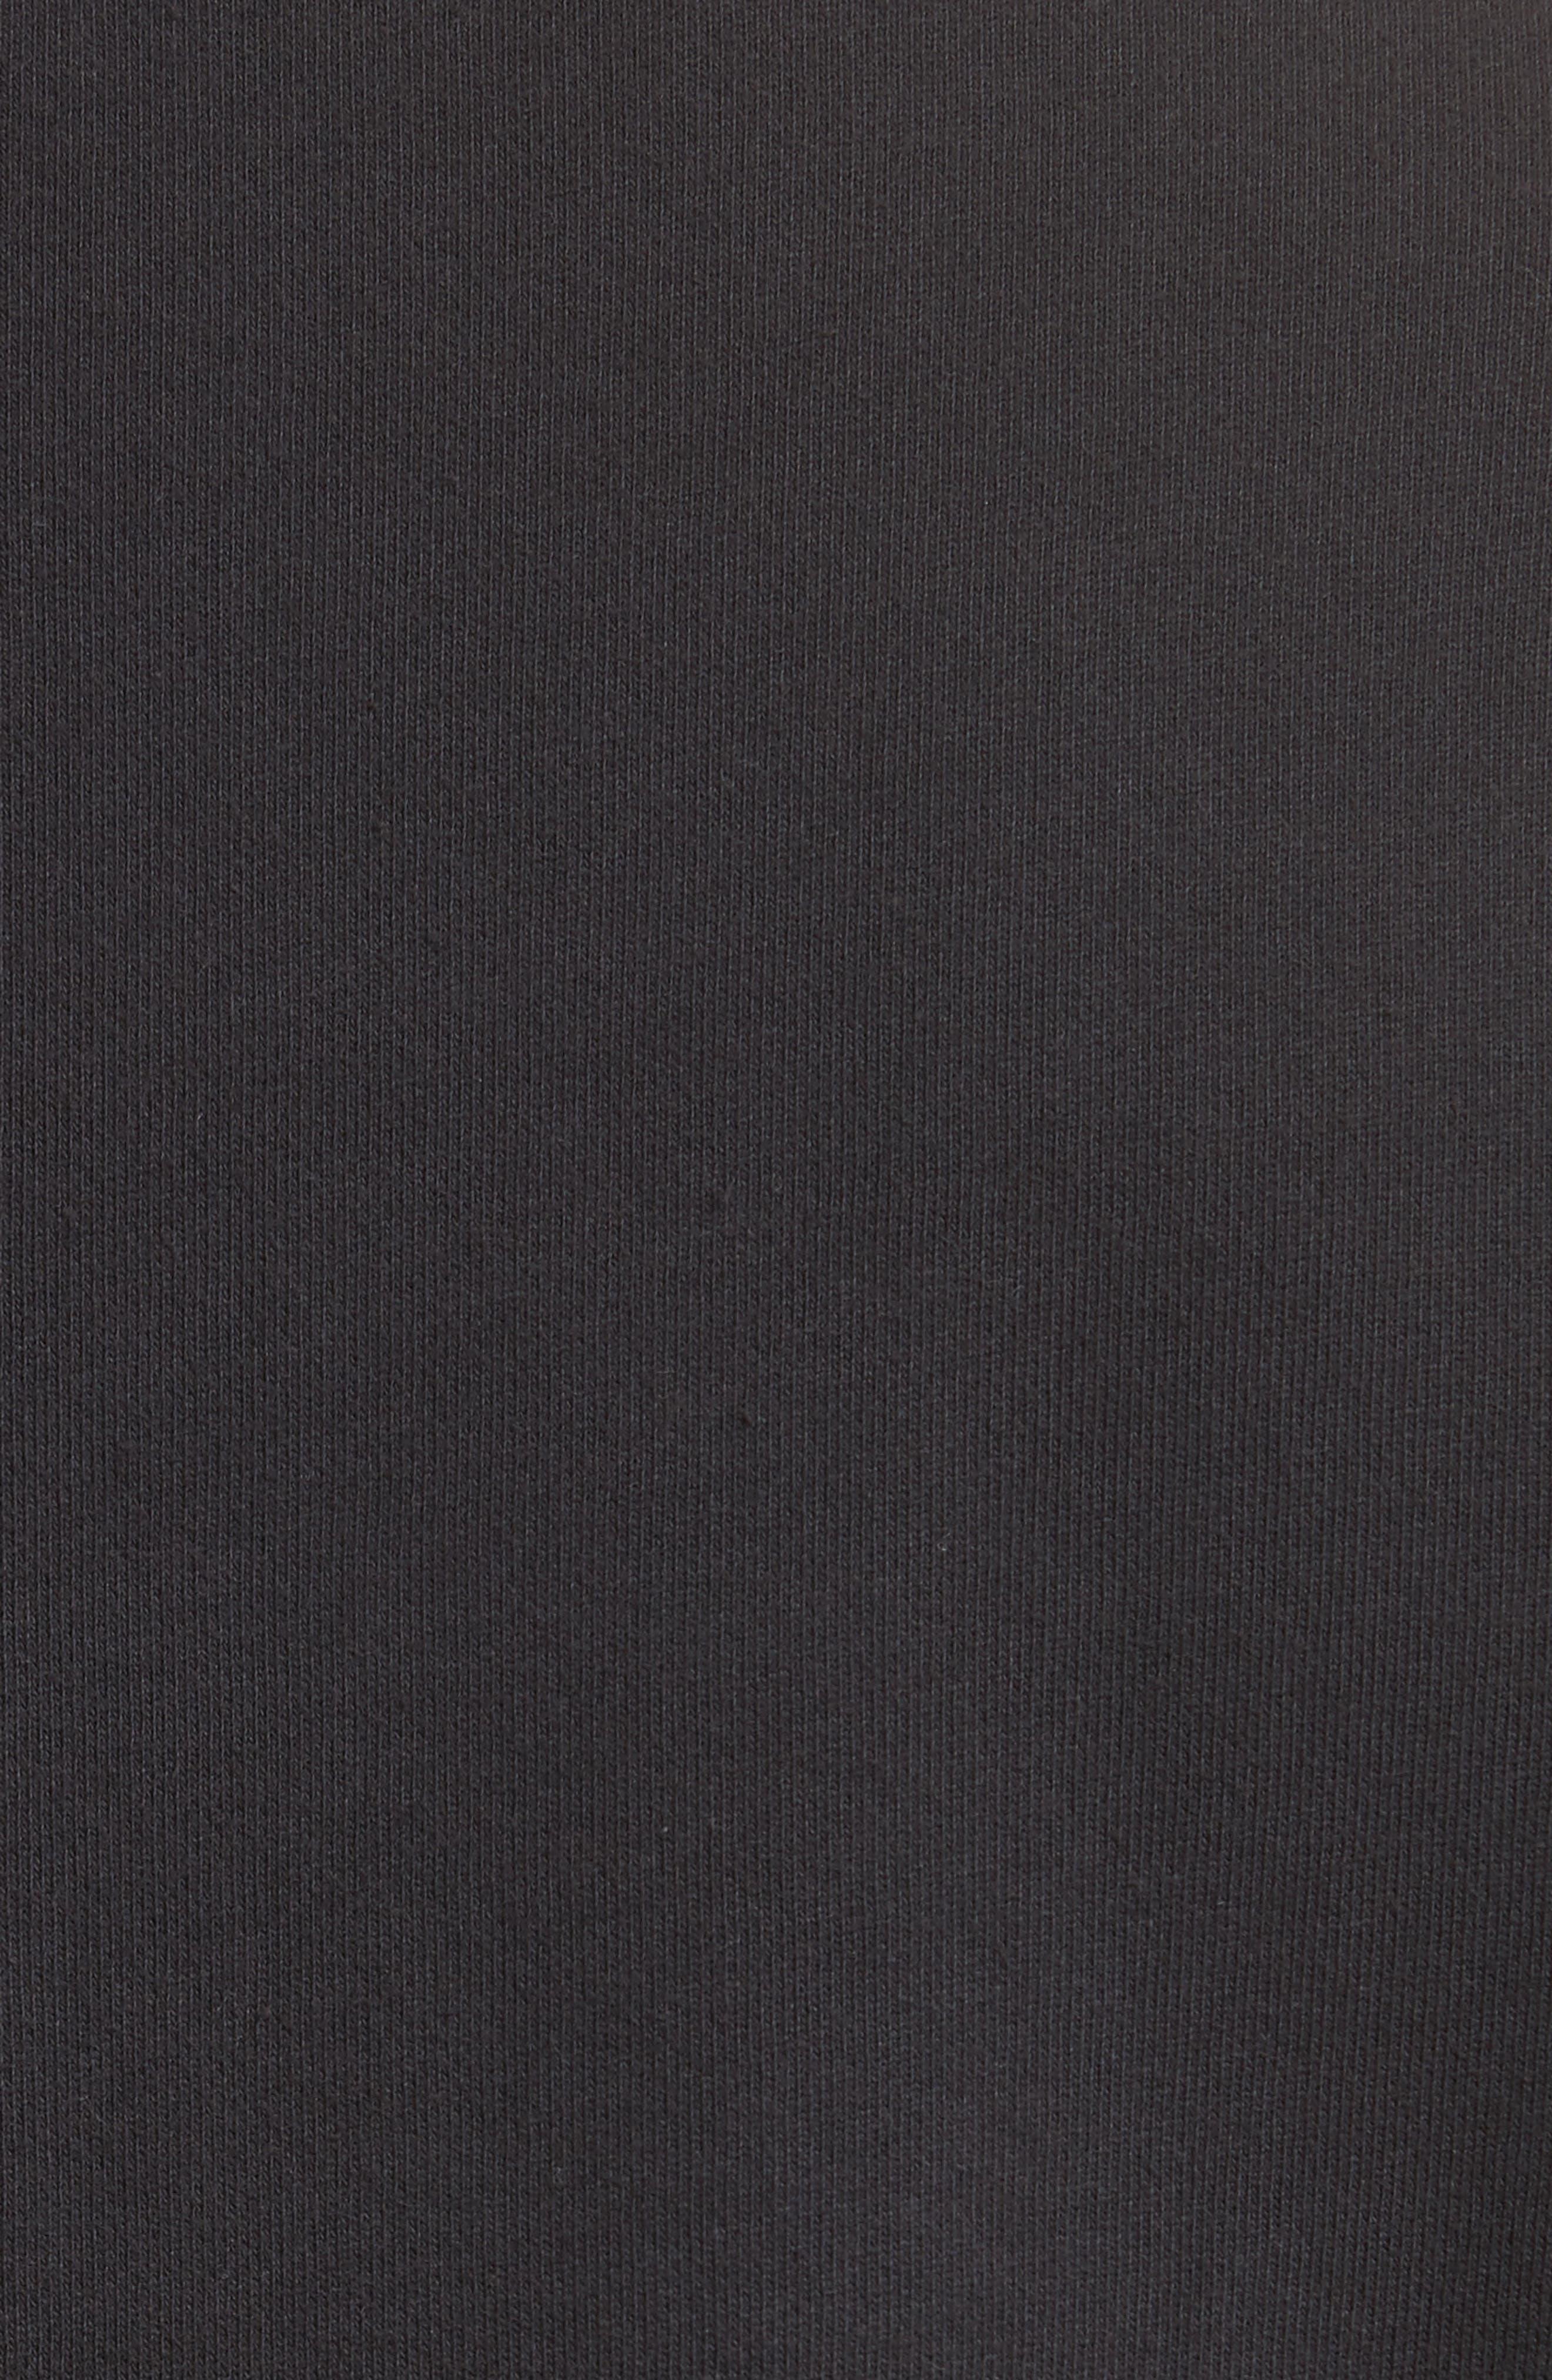 Pins Distressed Sweatshirt,                             Alternate thumbnail 5, color,                             Black